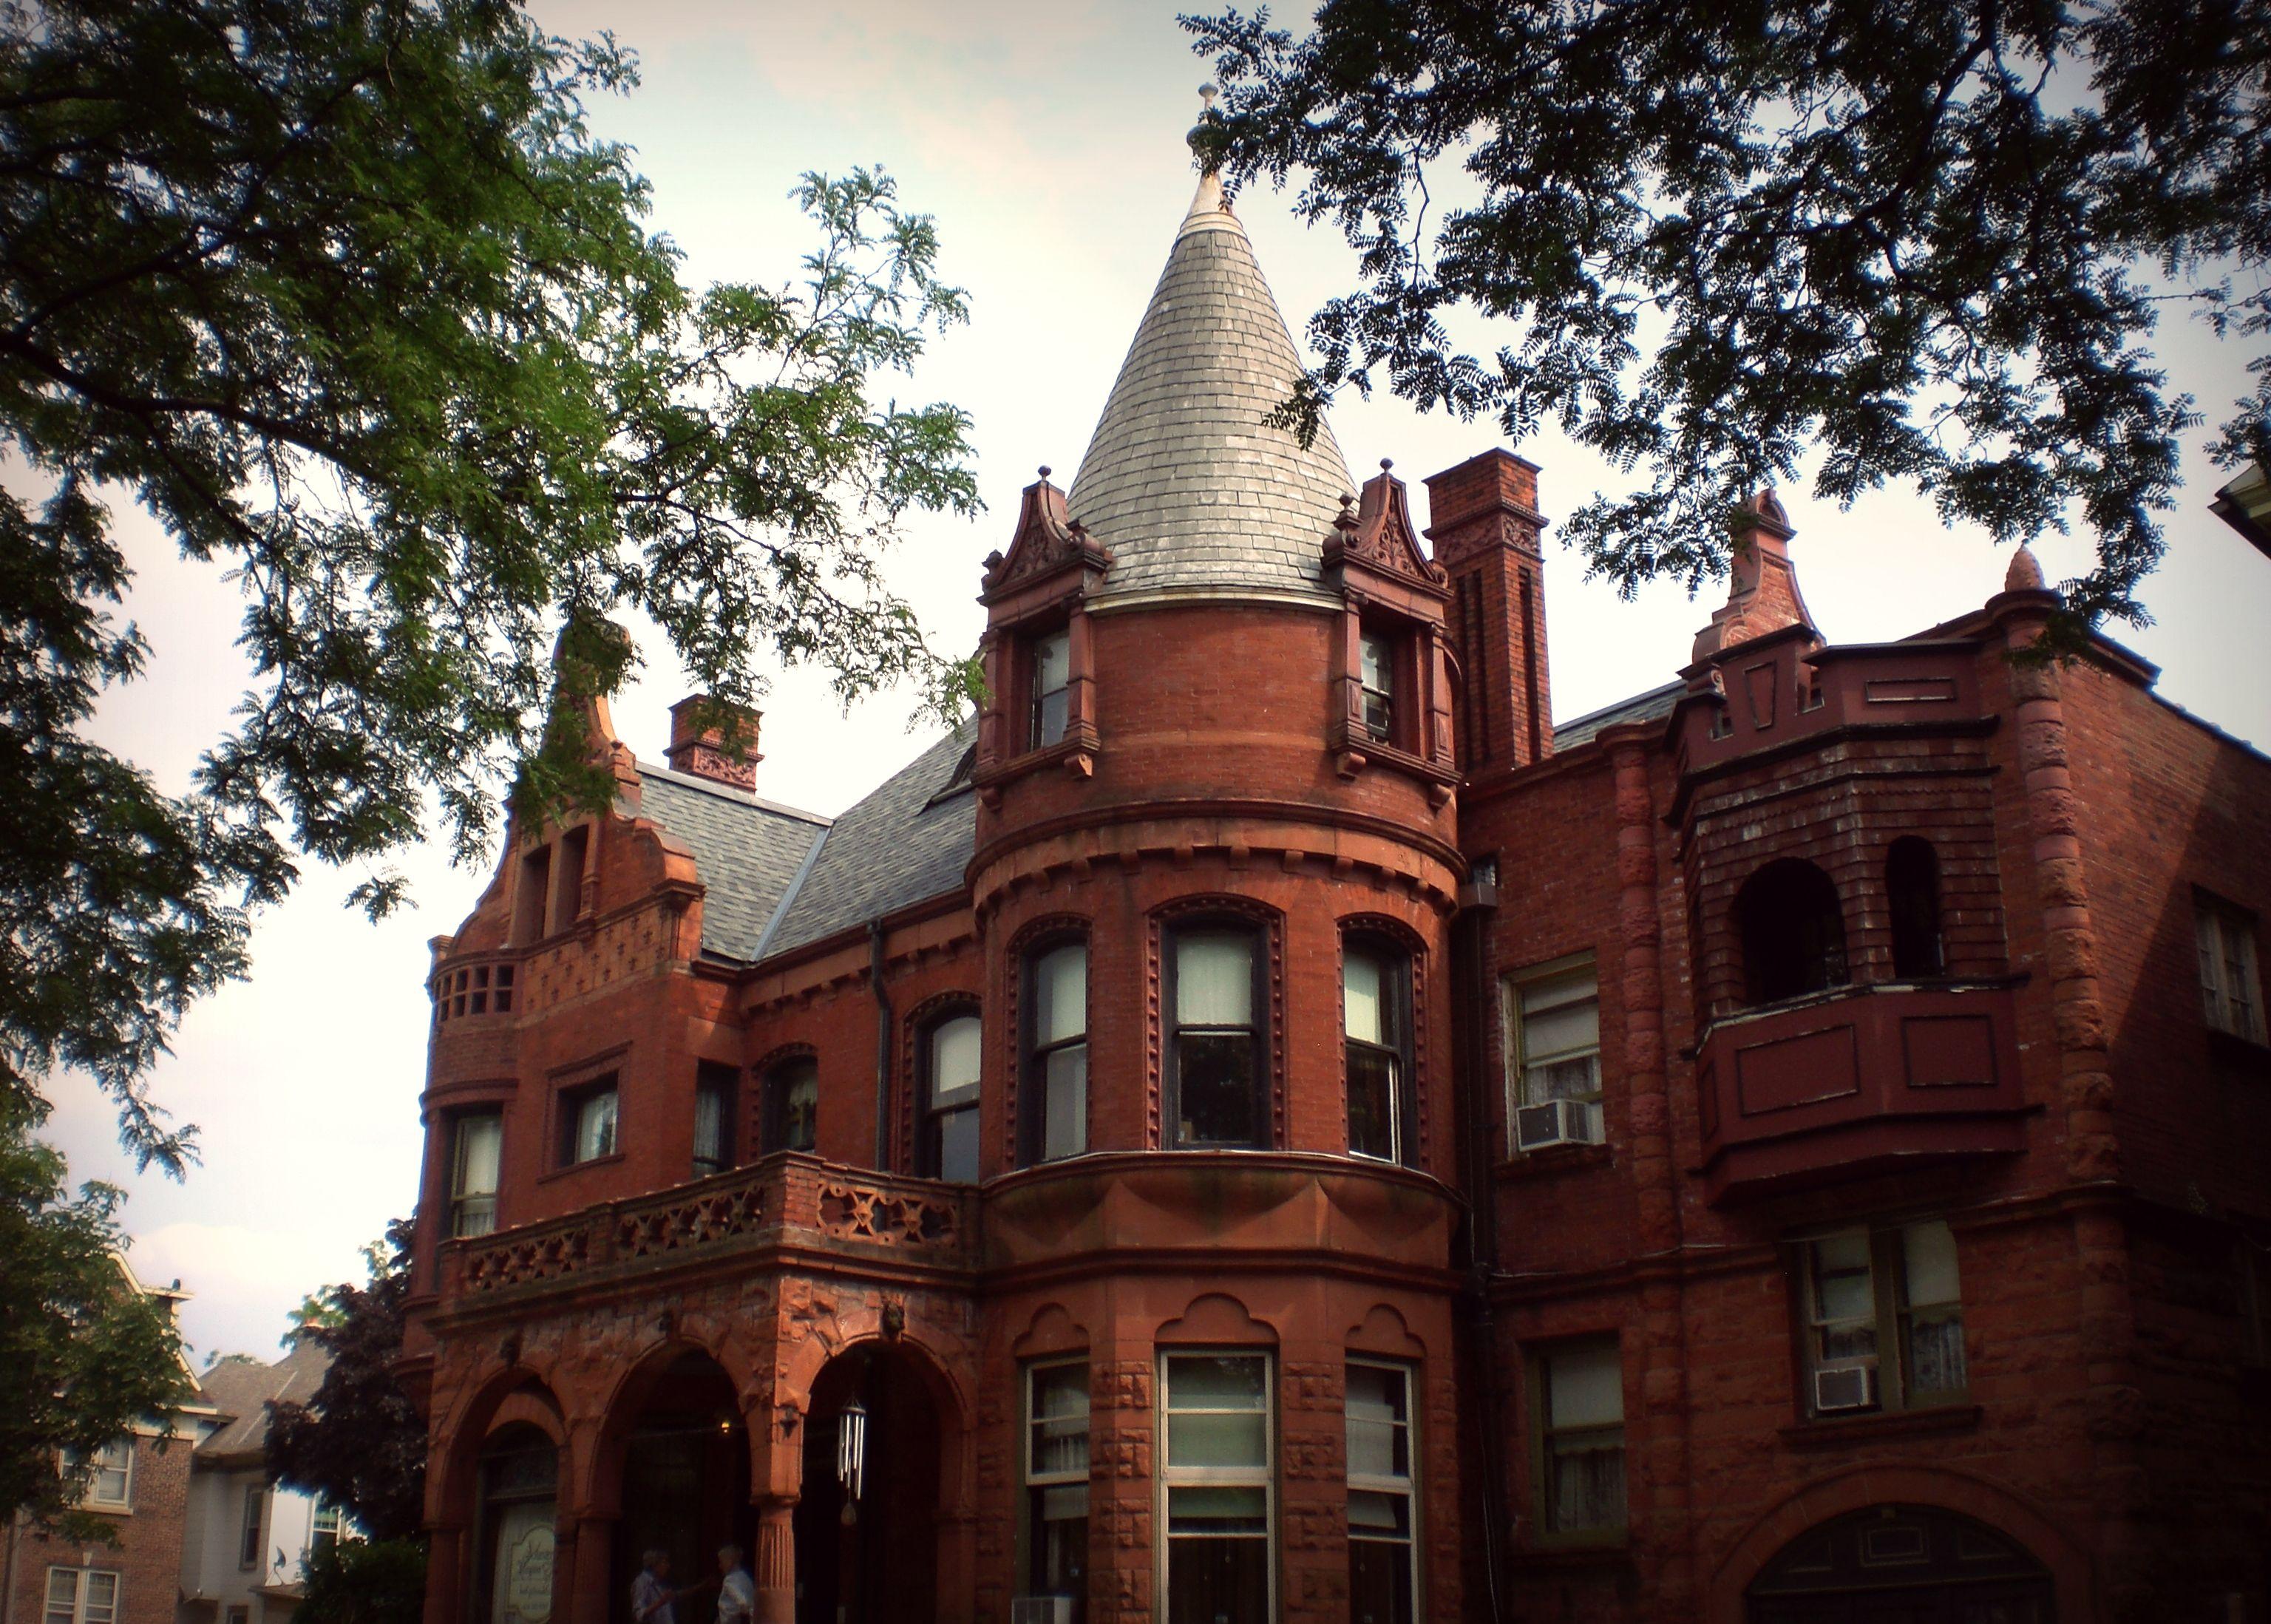 Schuster Mansion Bed Breakfast In Milwaukee Wi Bed And Breakfast Mansions Milwaukee Wi